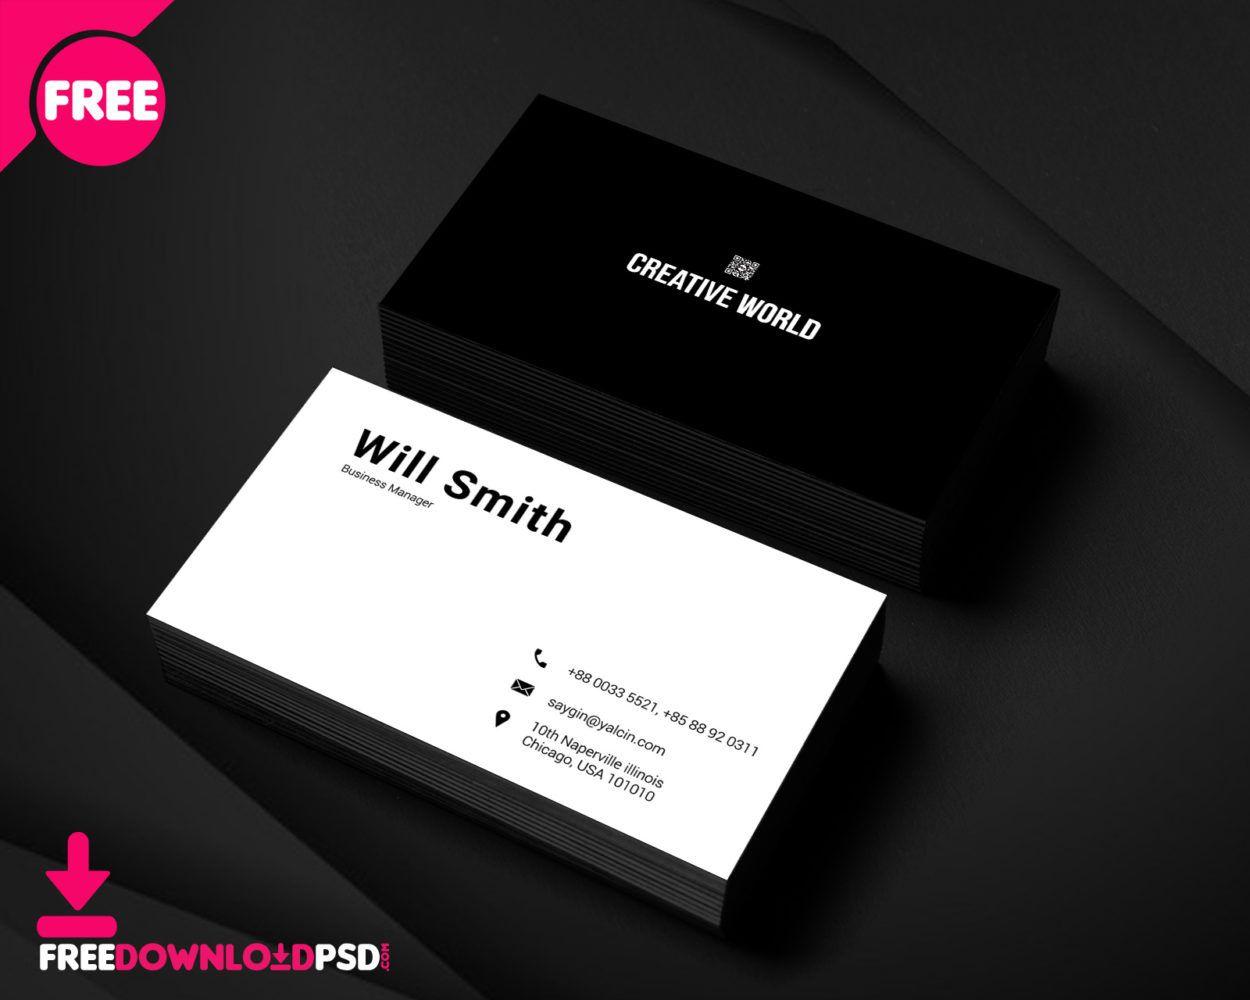 007 Astounding Minimal Busines Card Template Free Download Picture  Simple Design CoreldrawFull